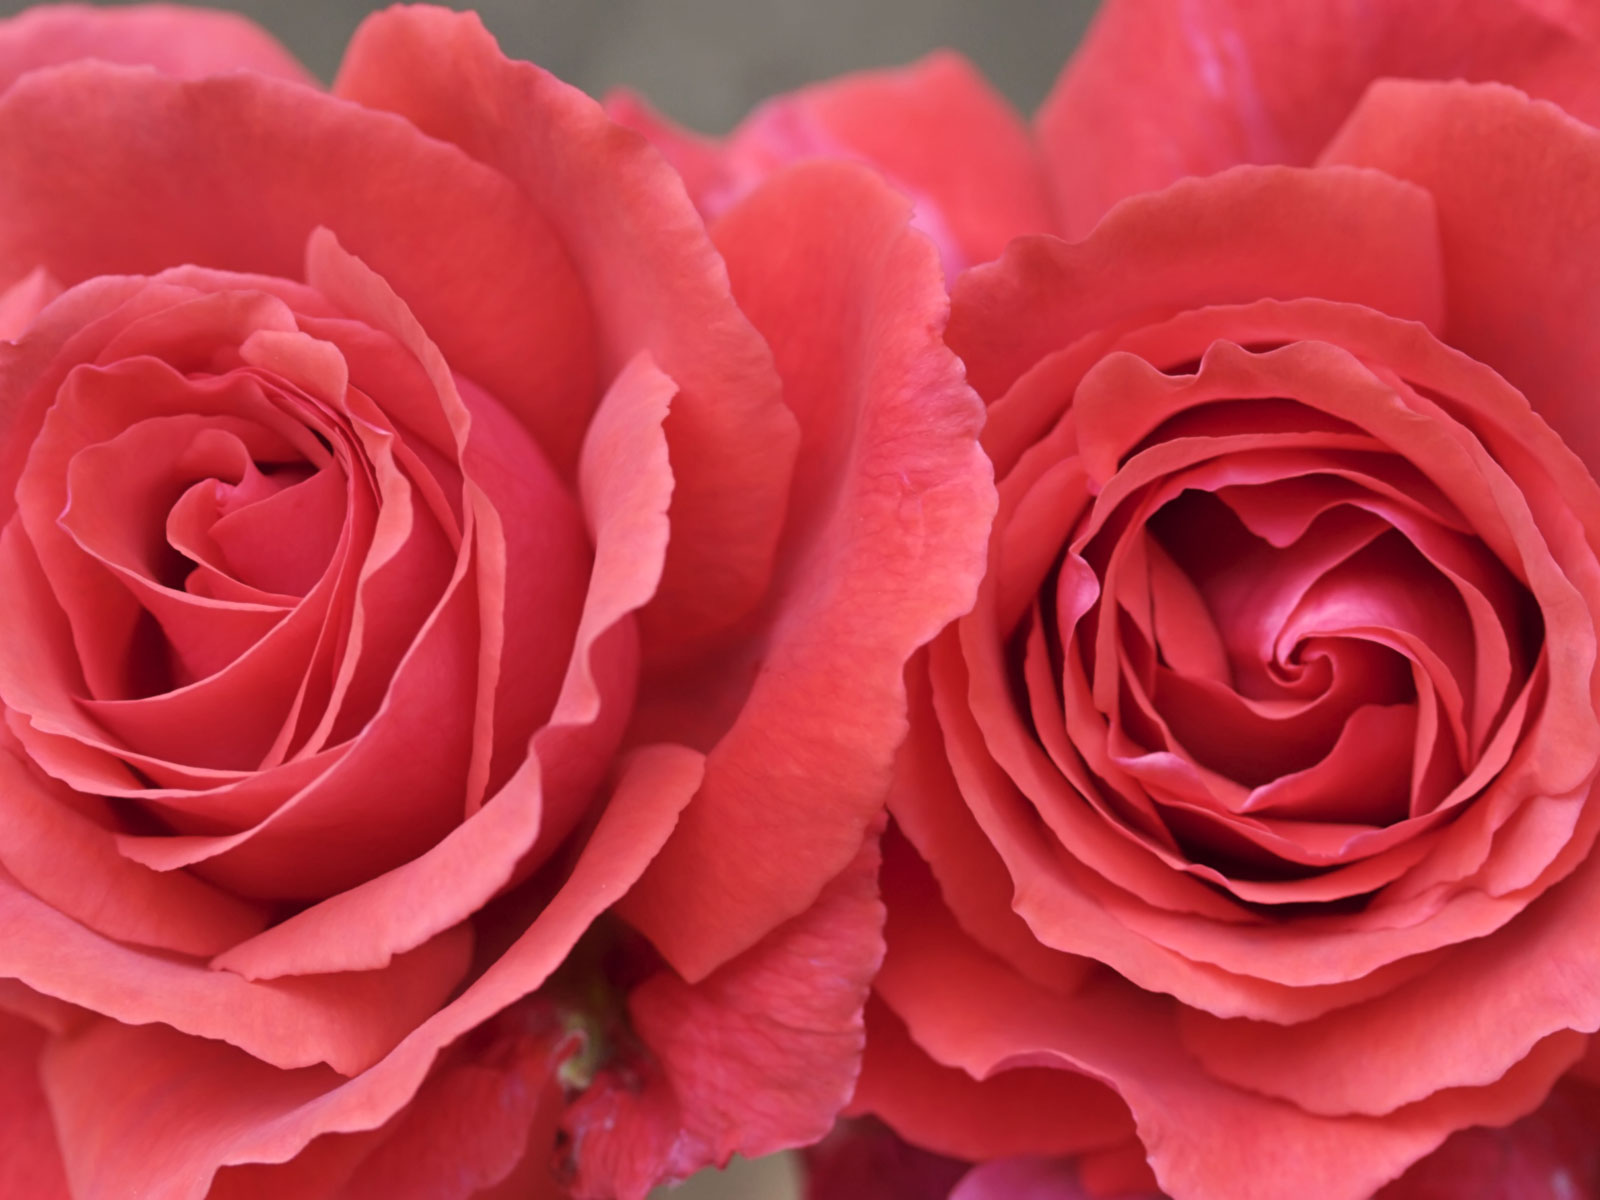 top desktop roses wallpapers hd rose wallpaper 25 zoom pink rosesjpg 1600x1200